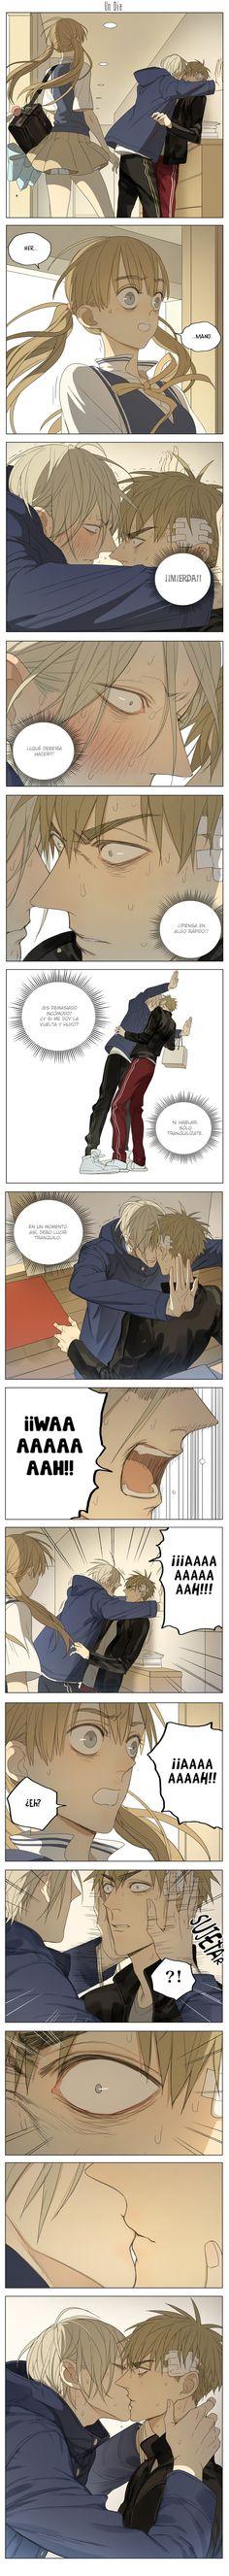 19 Days Capítulo 11 página 12, 19 Days Manga Español, lectura 19 Days Capítulo 170 online